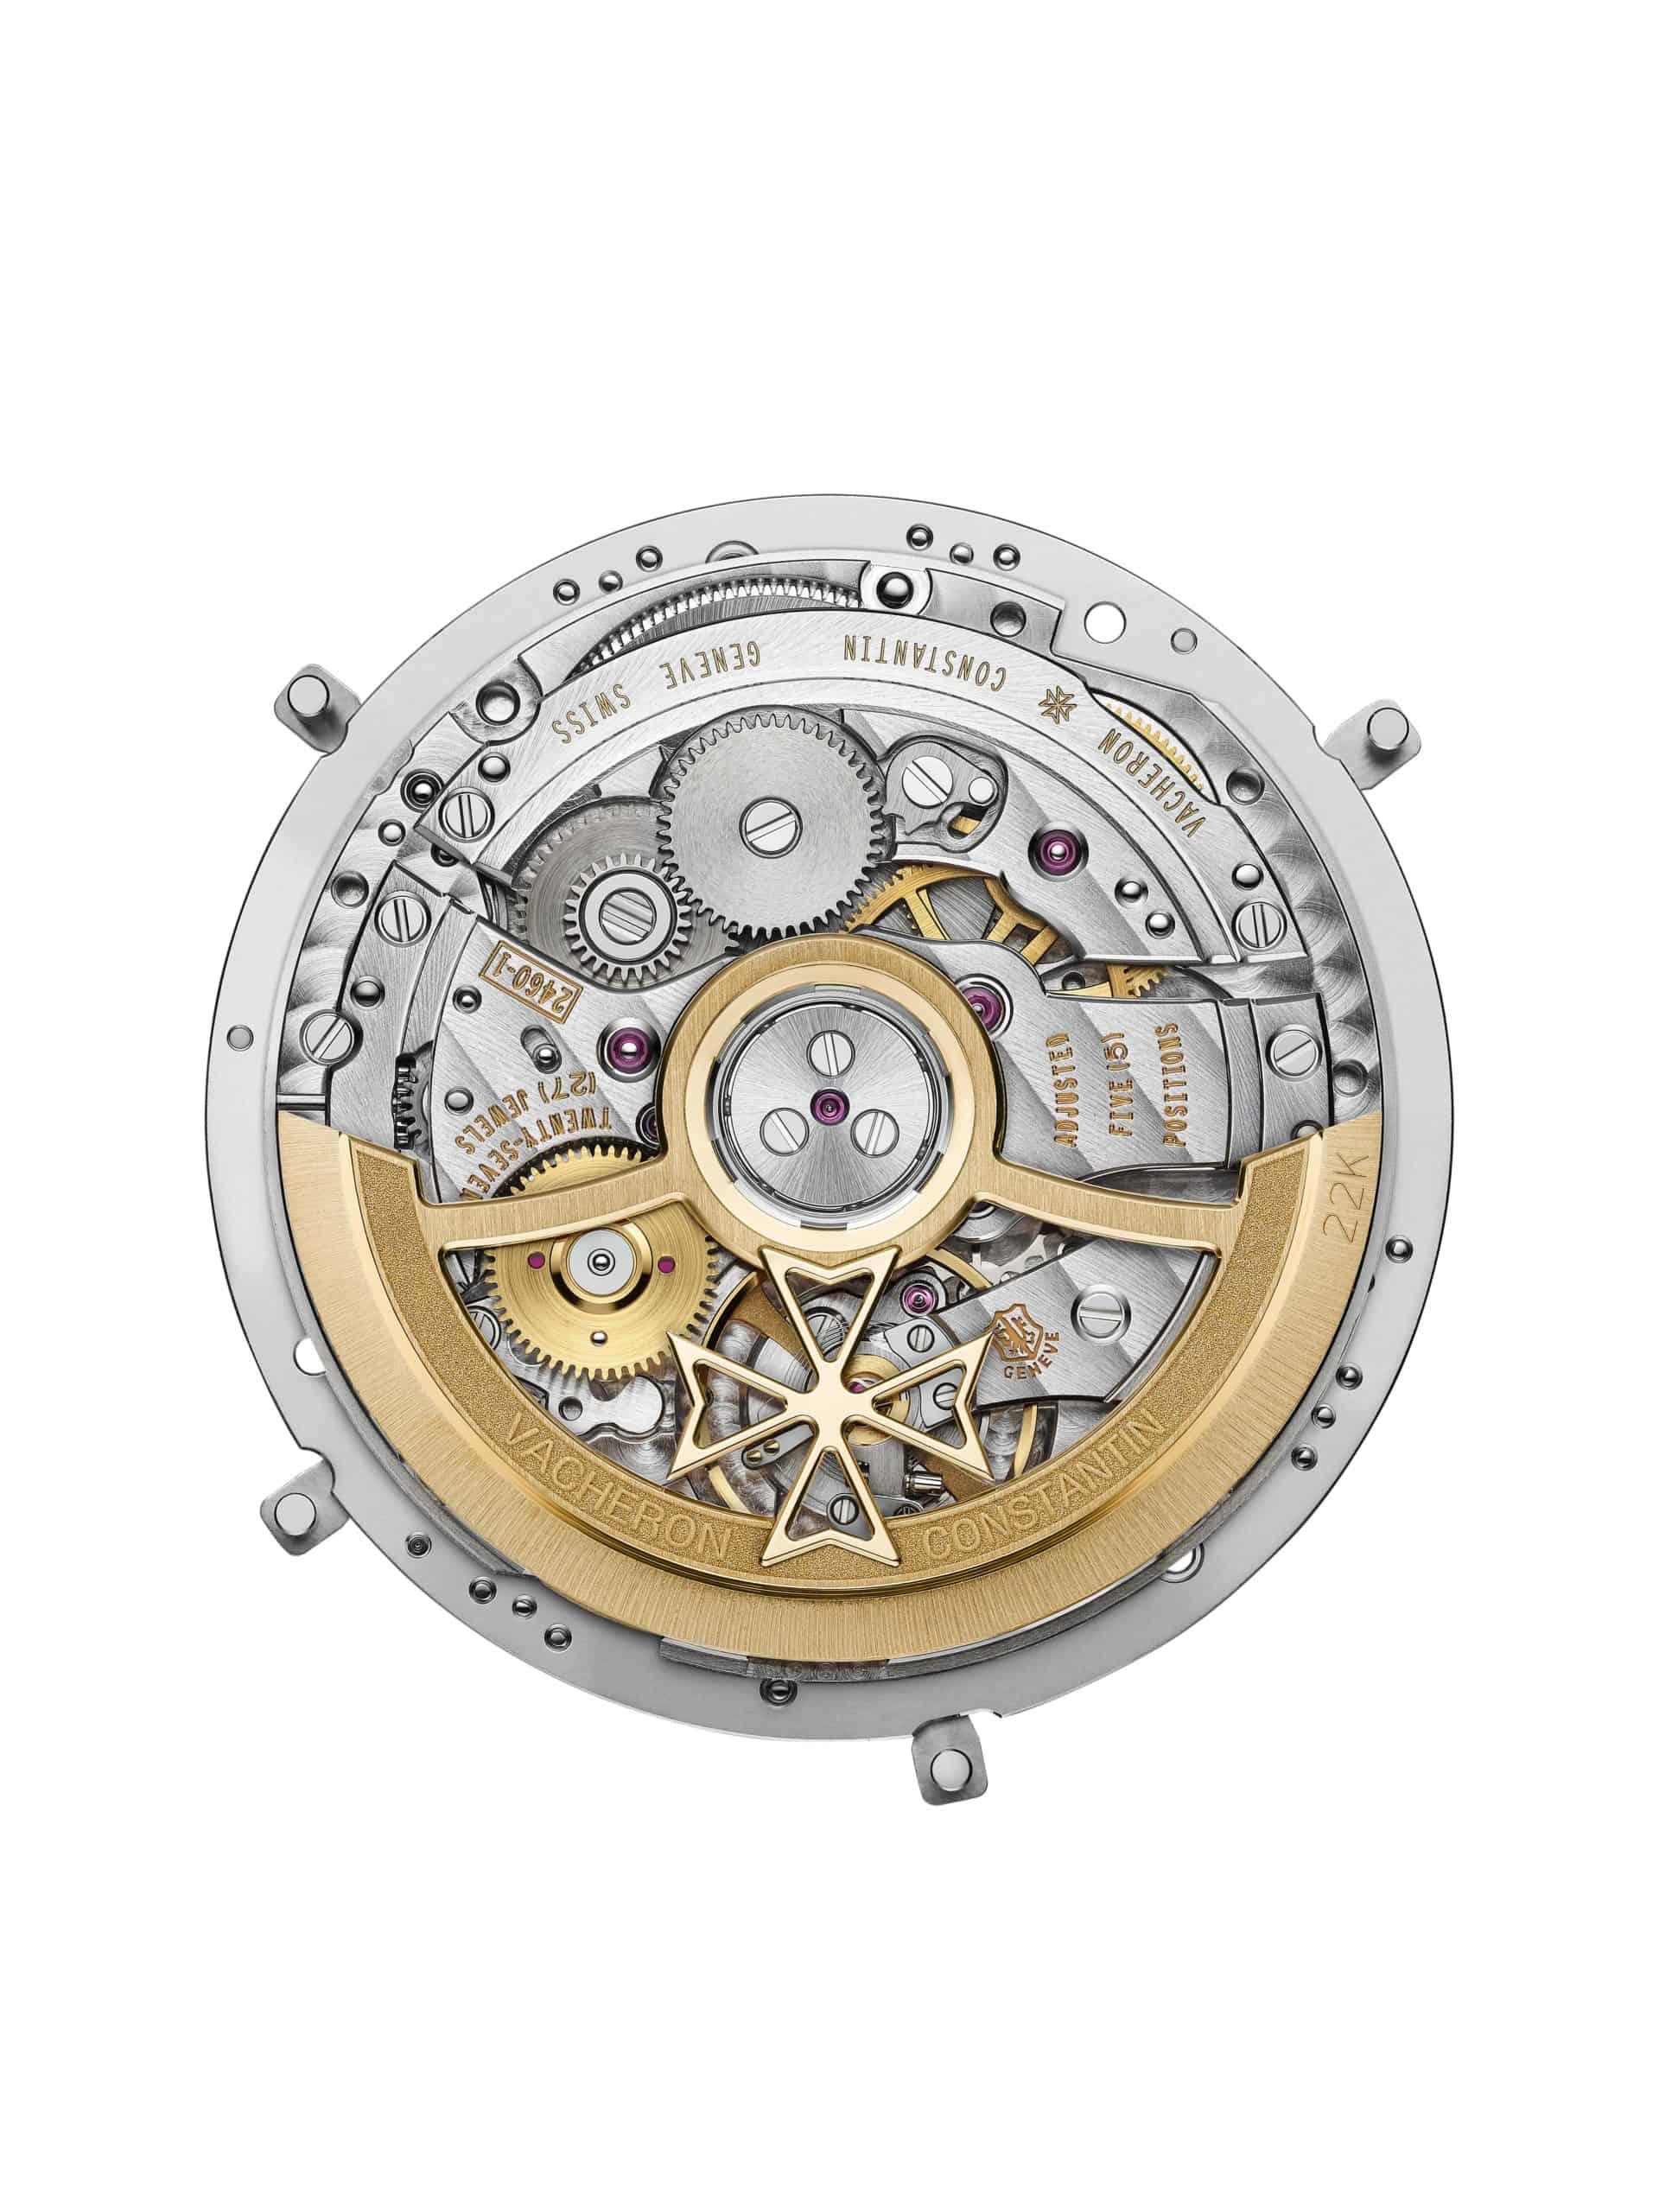 Vacheron Constantin FiftySix Automatik Vollkalender Kaliber 2460 QCL1 V tr 1651479